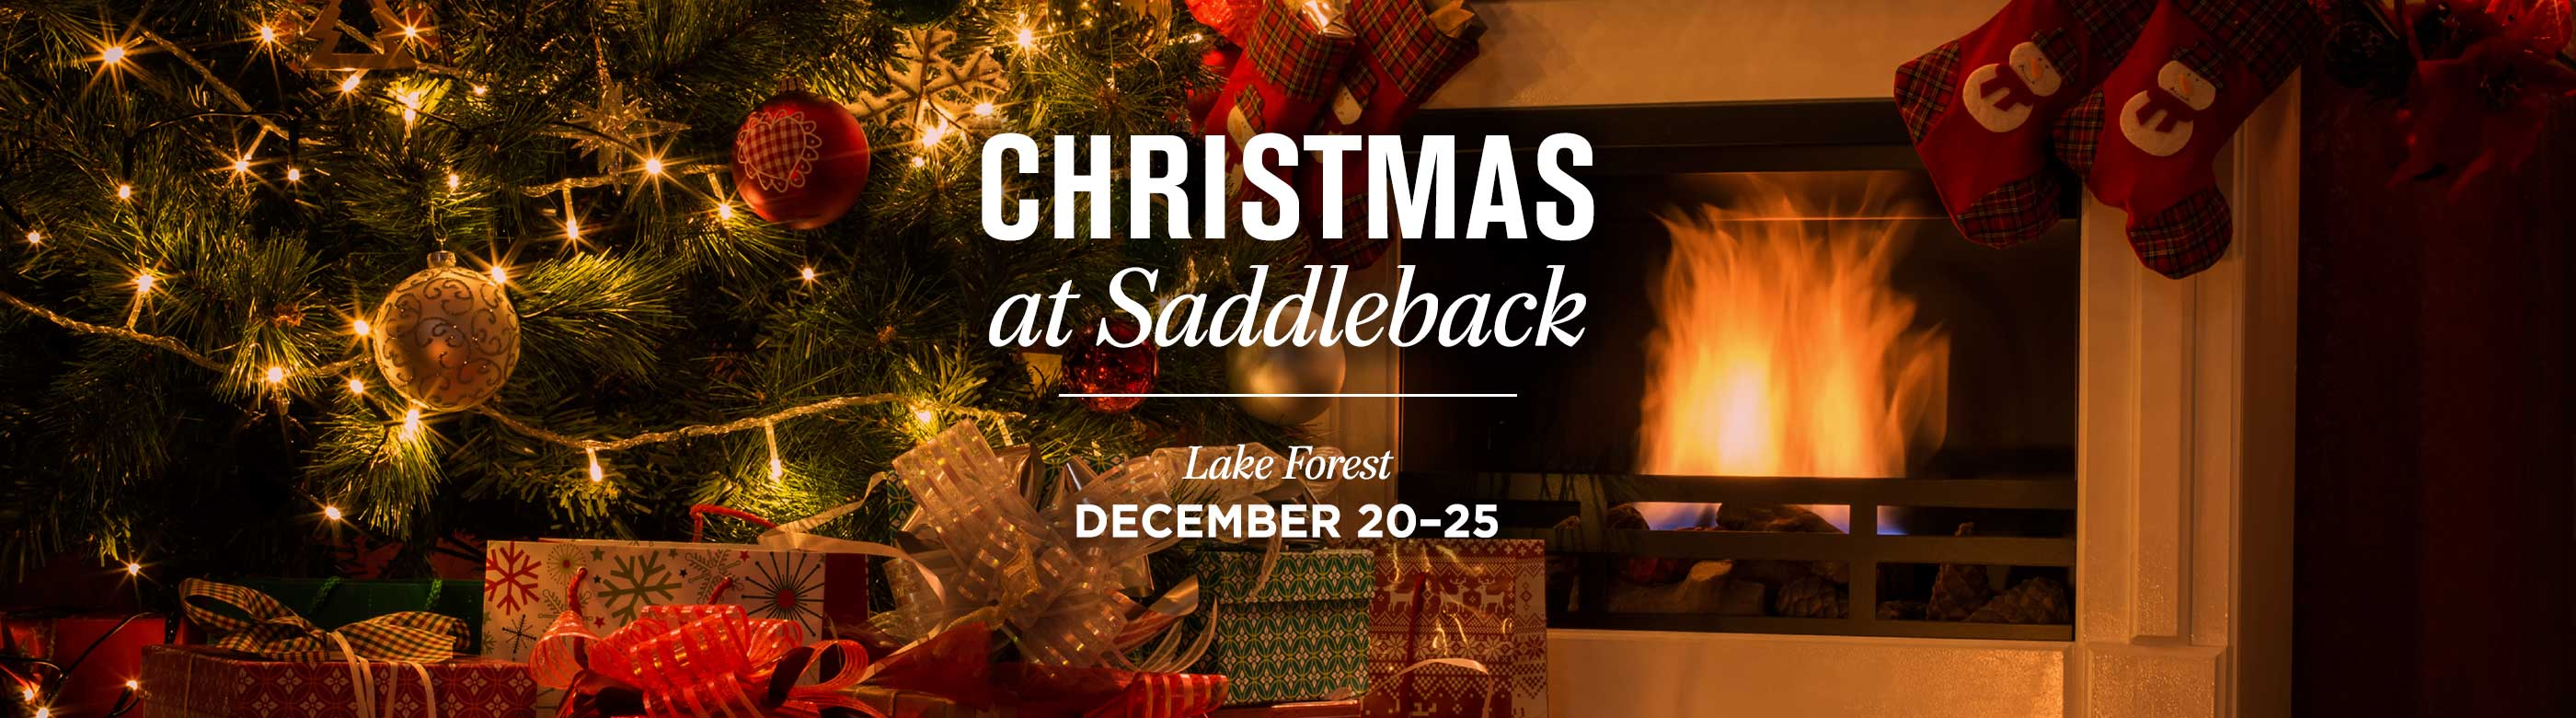 Saddleback Church 2020 Christmas Services Saddleback Church: Events: Christmas at Saddleback: Los Angeles